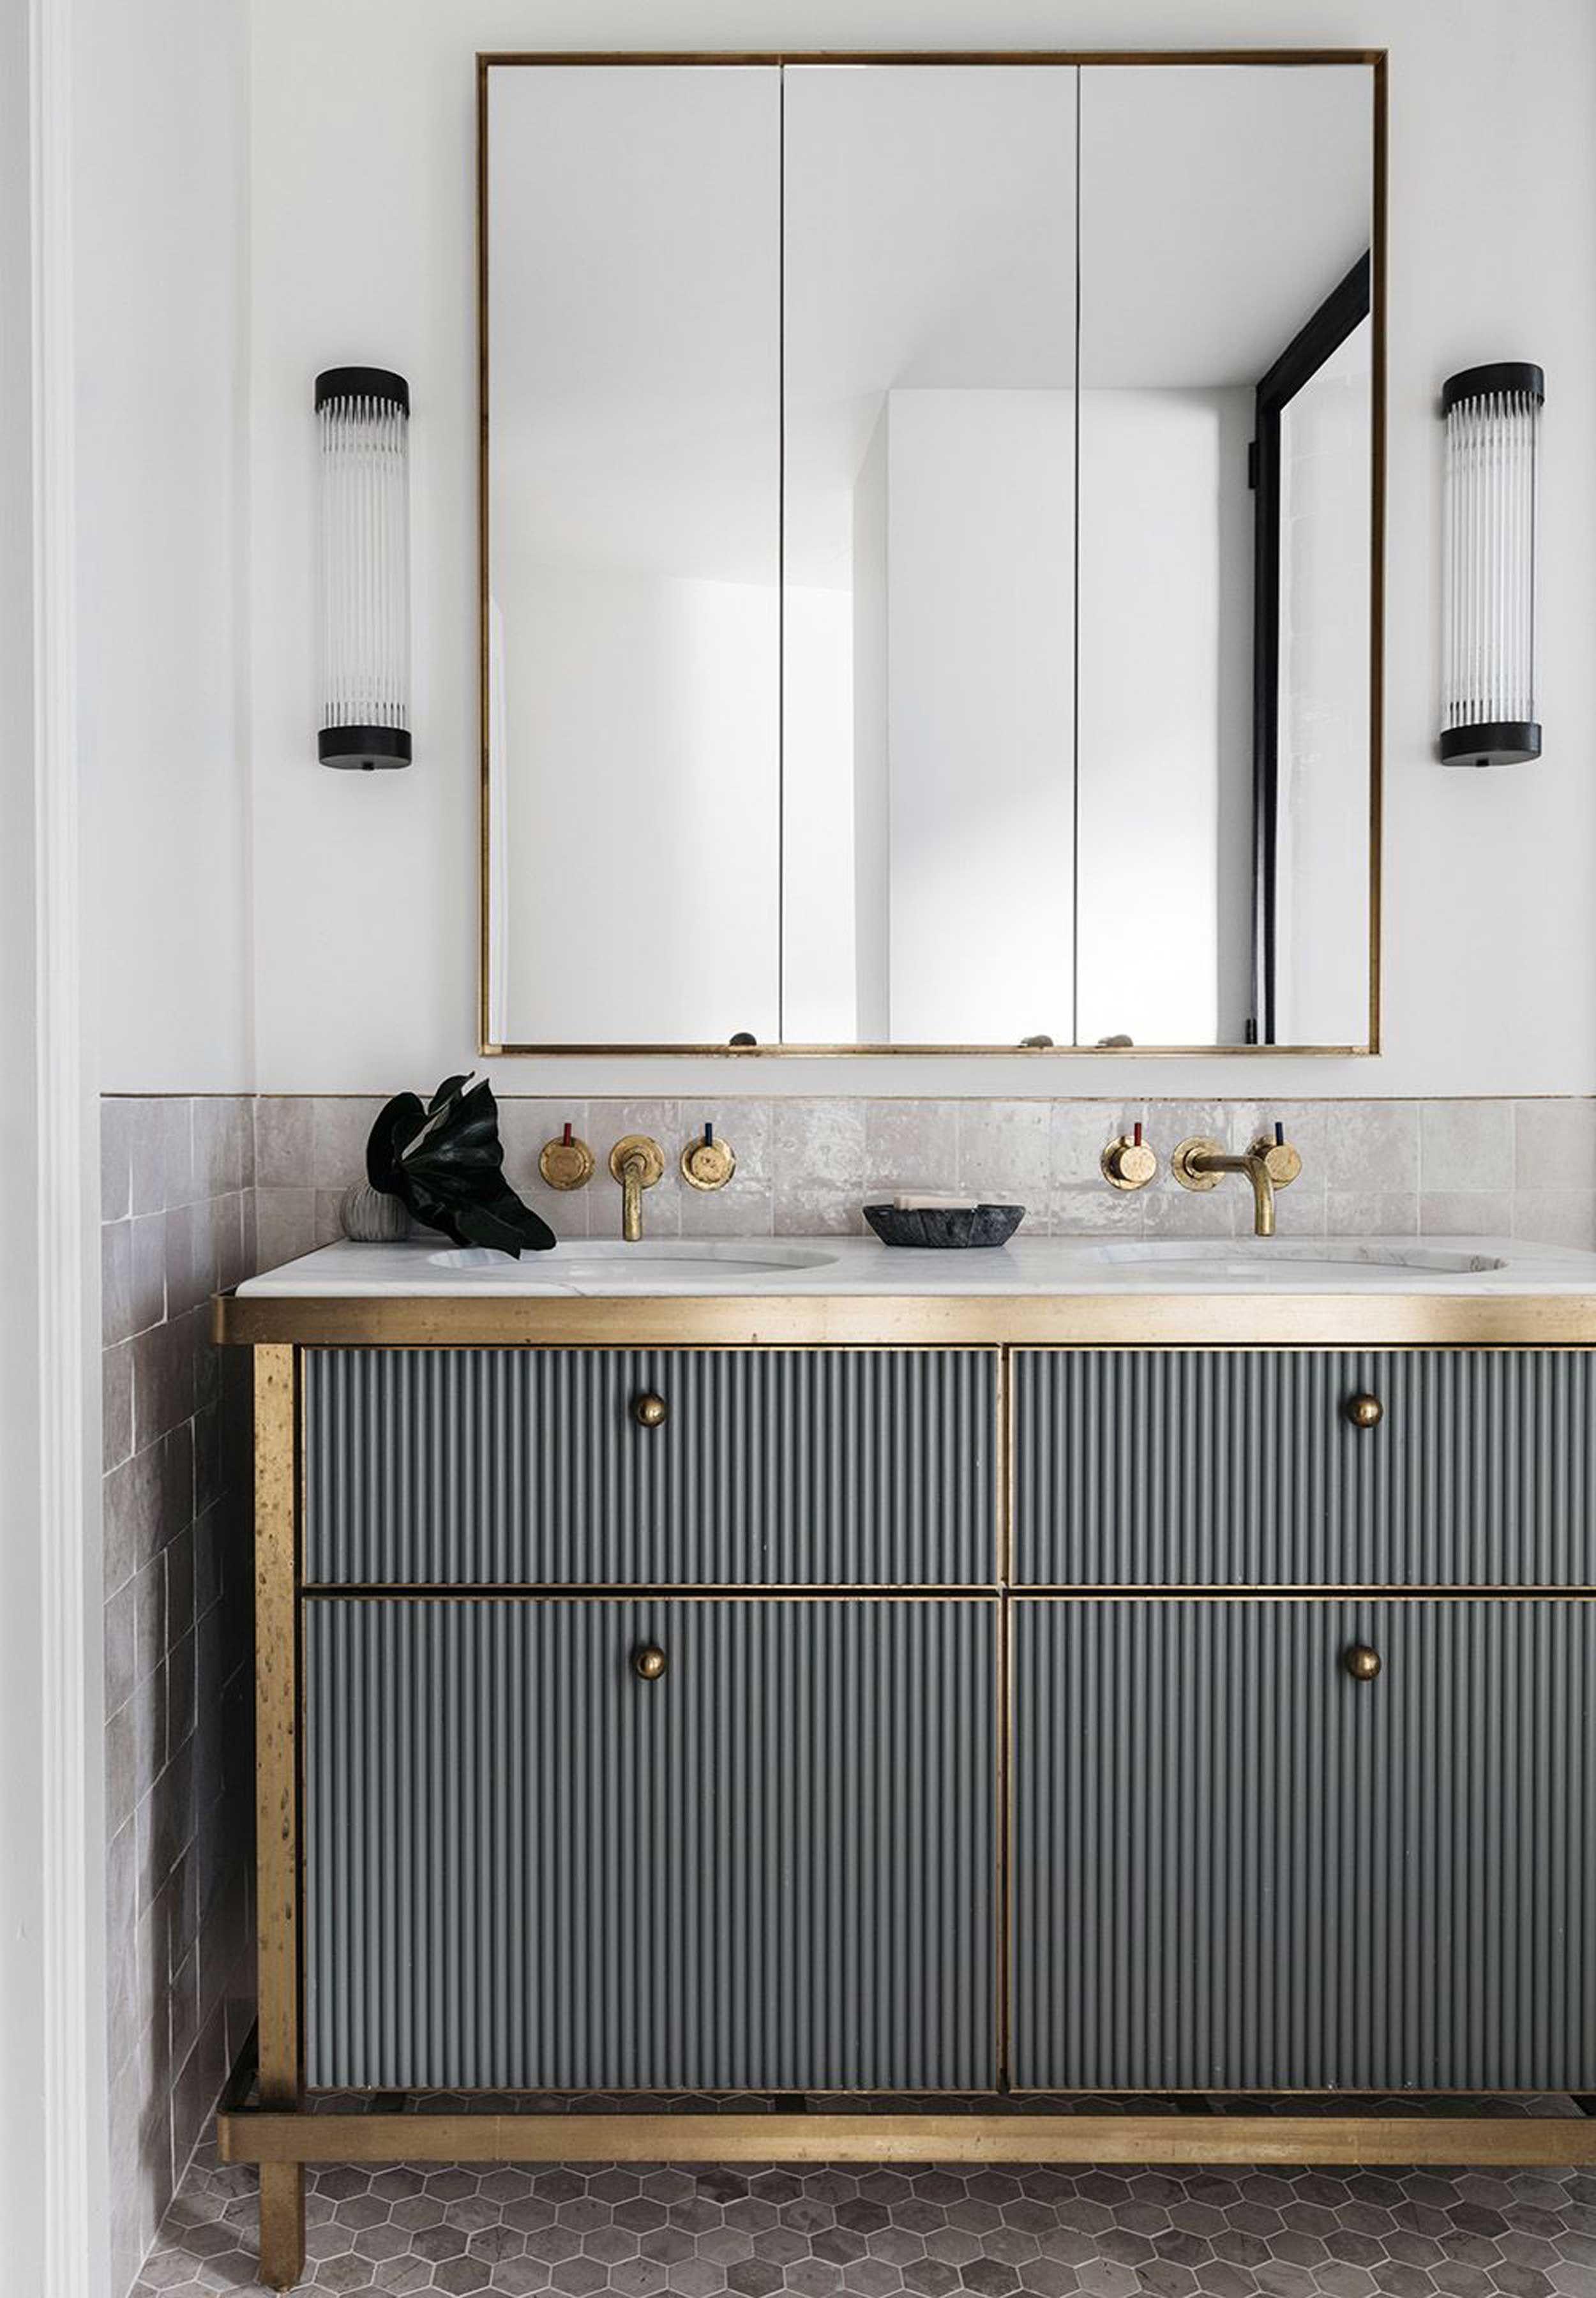 Pharmacy Wall Mount Medicine Cabinet 2021 Art Deco Bathroom Vanity Bathroom Interior Bathroom Interior Design [ 3600 x 2500 Pixel ]